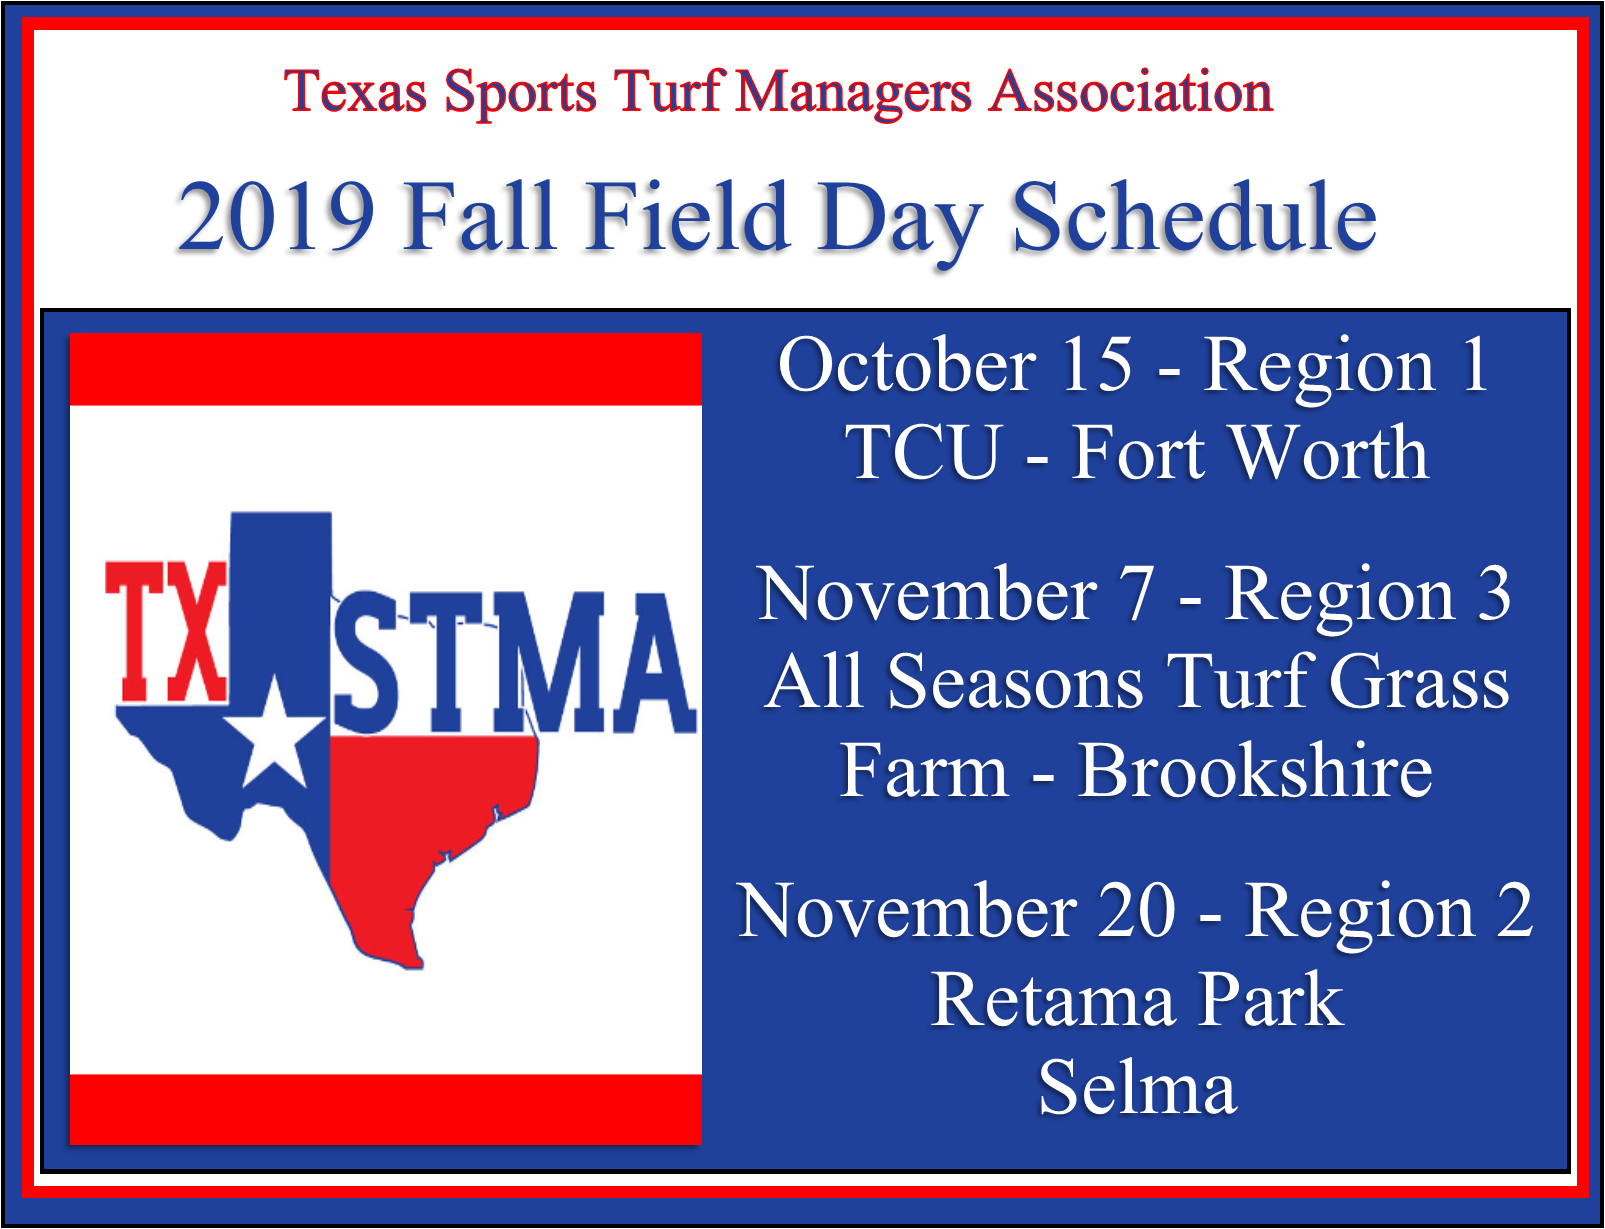 Fall Field Day Schedule